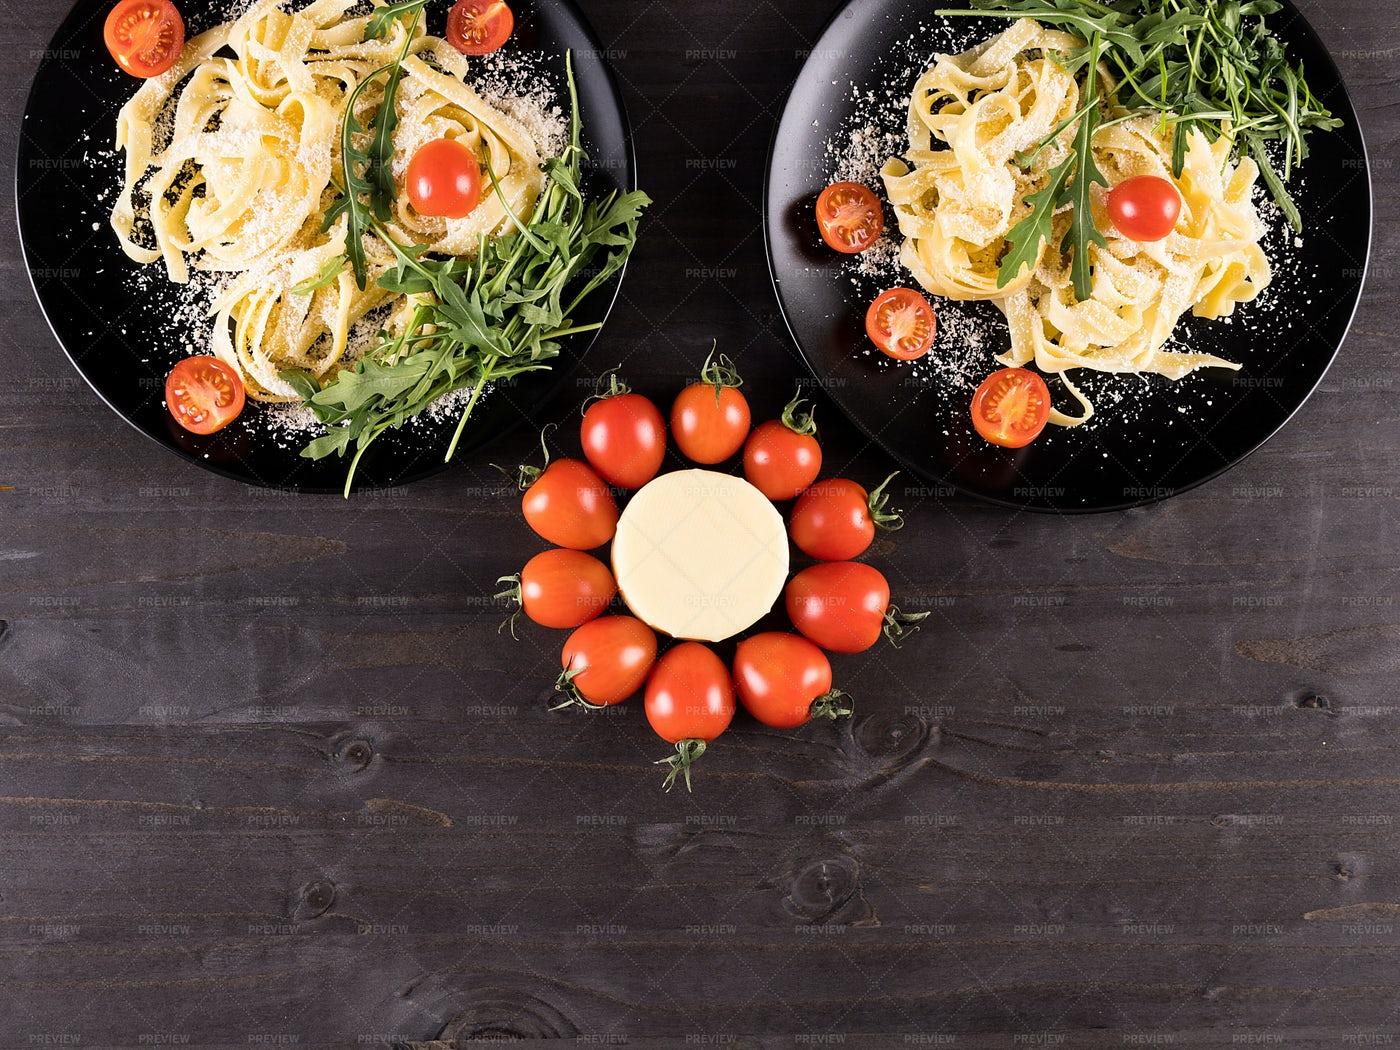 Italian Pasta And Raw Vegetables: Stock Photos